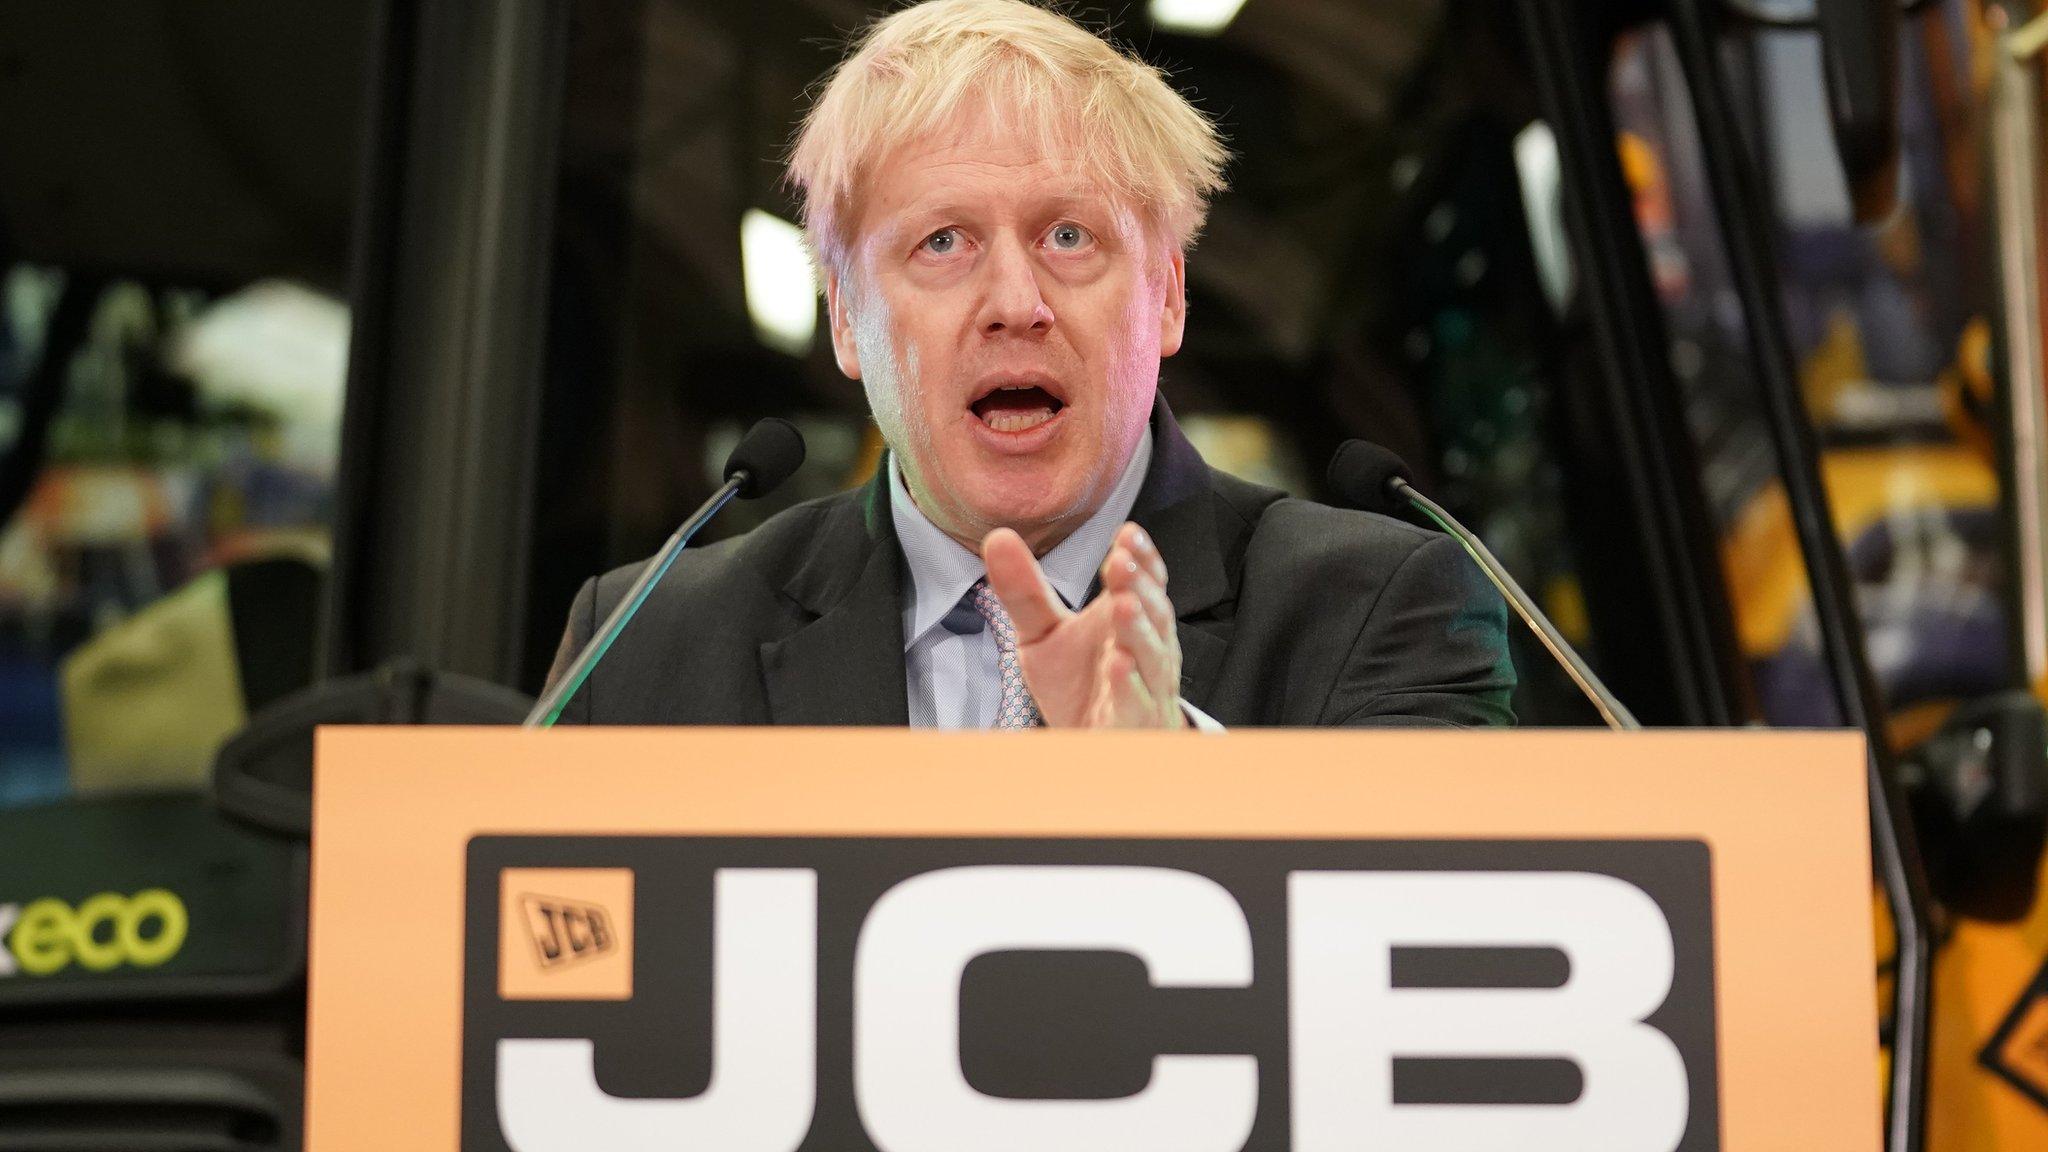 Did Johnson talk Turkey during Brexit campaign?